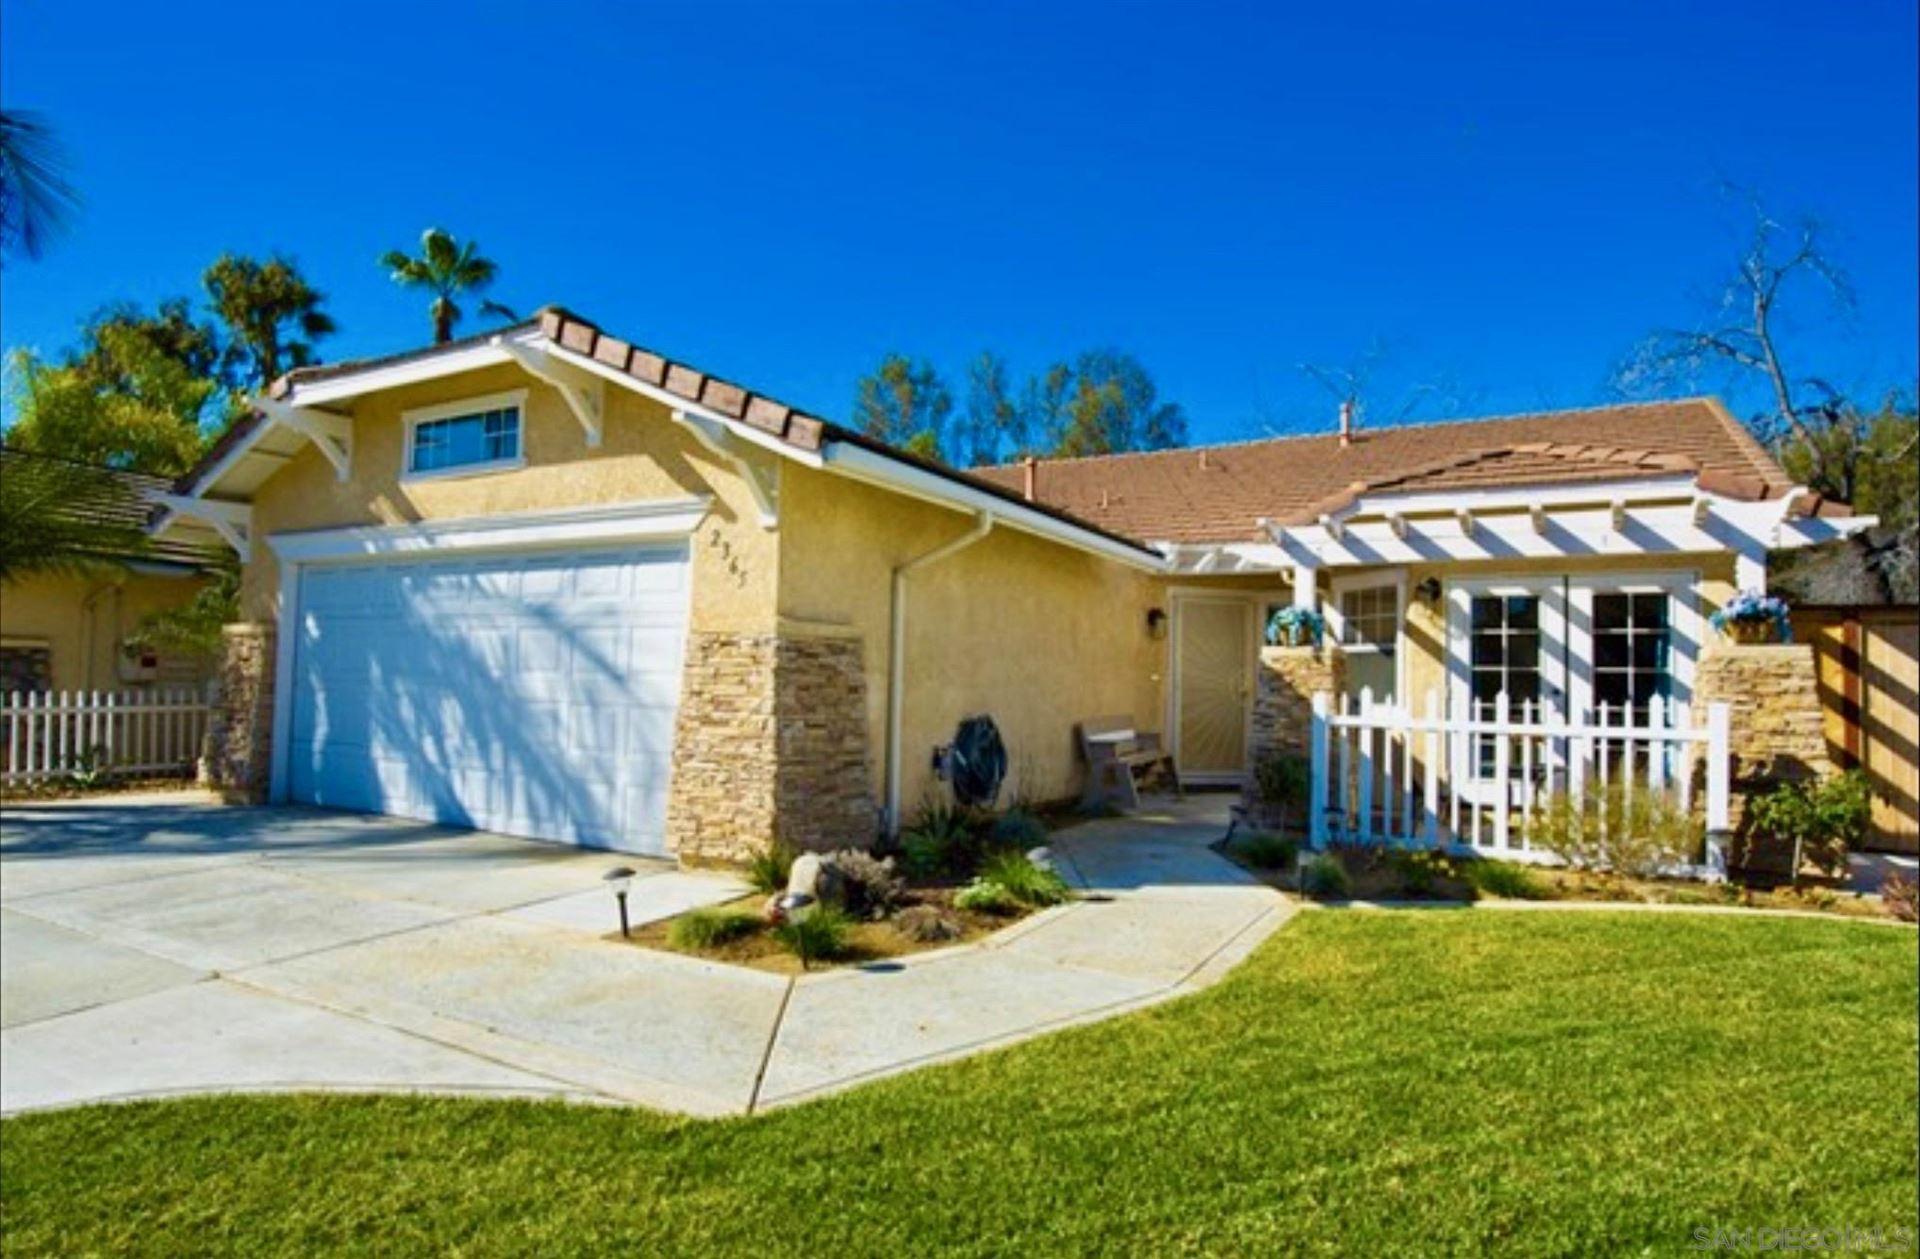 Photo of 2365 Sandy Ln, Vista, CA 92081 (MLS # 210024710)